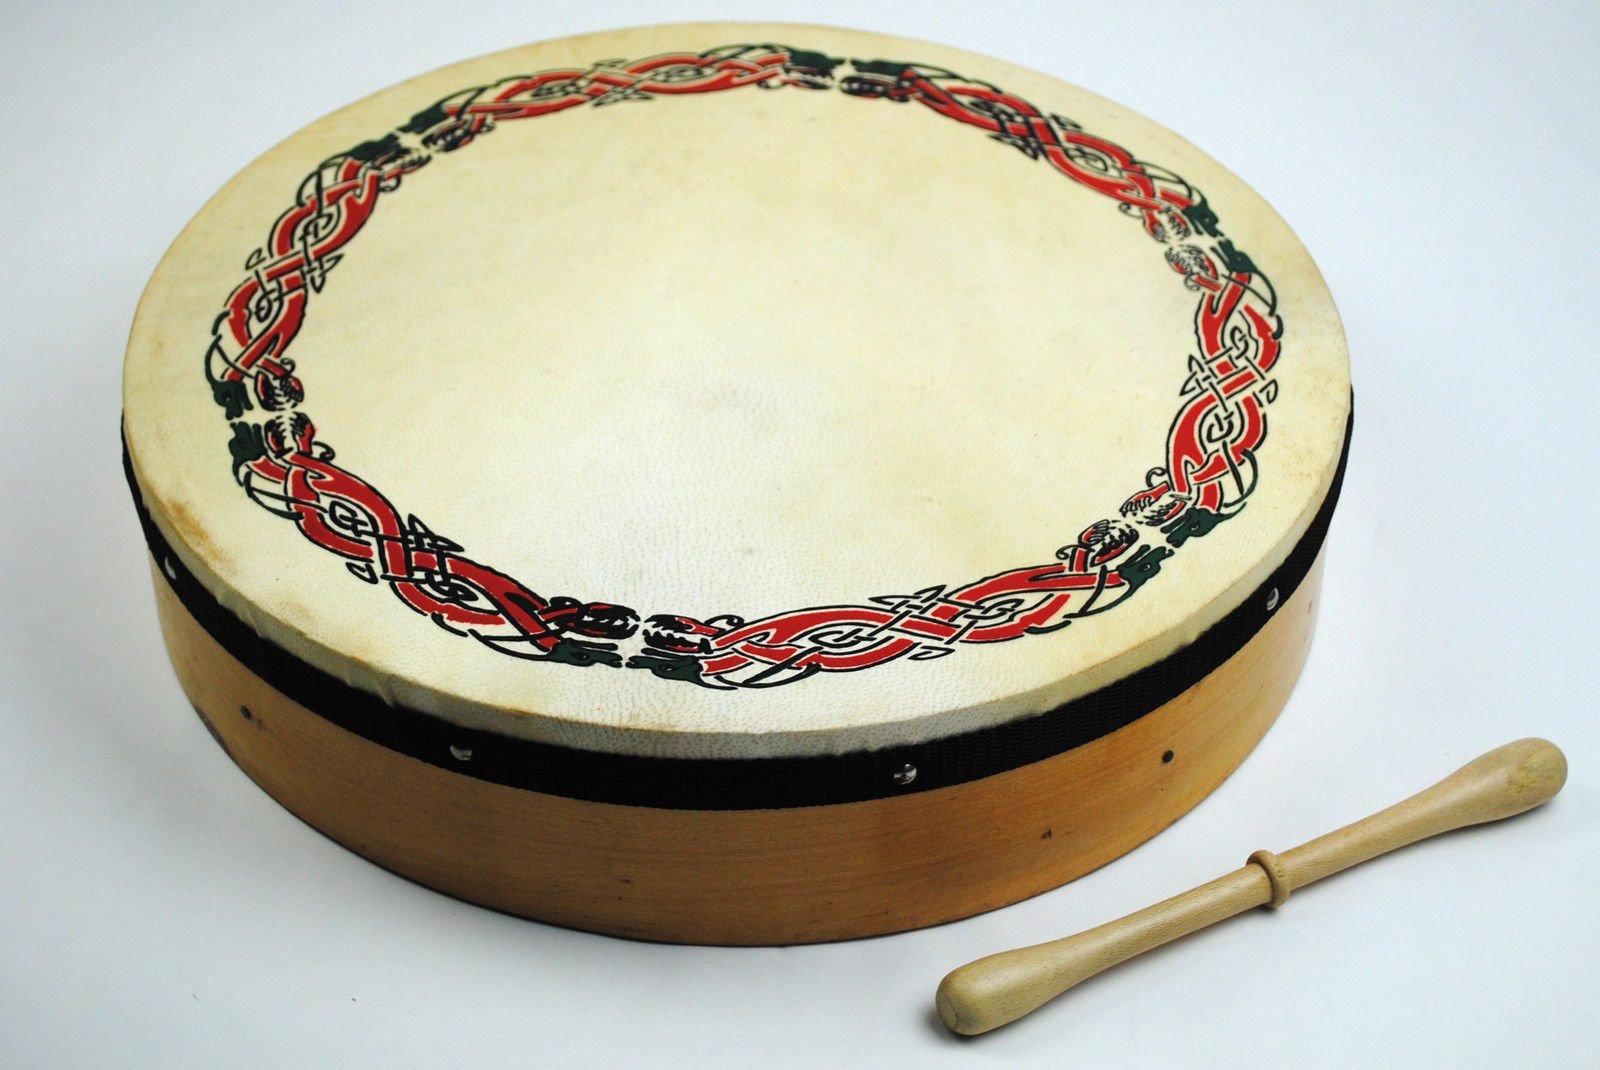 16'' Diameter Celtic Pattern Celtic Pattern Bodhran- Irish Drum Starter Pack